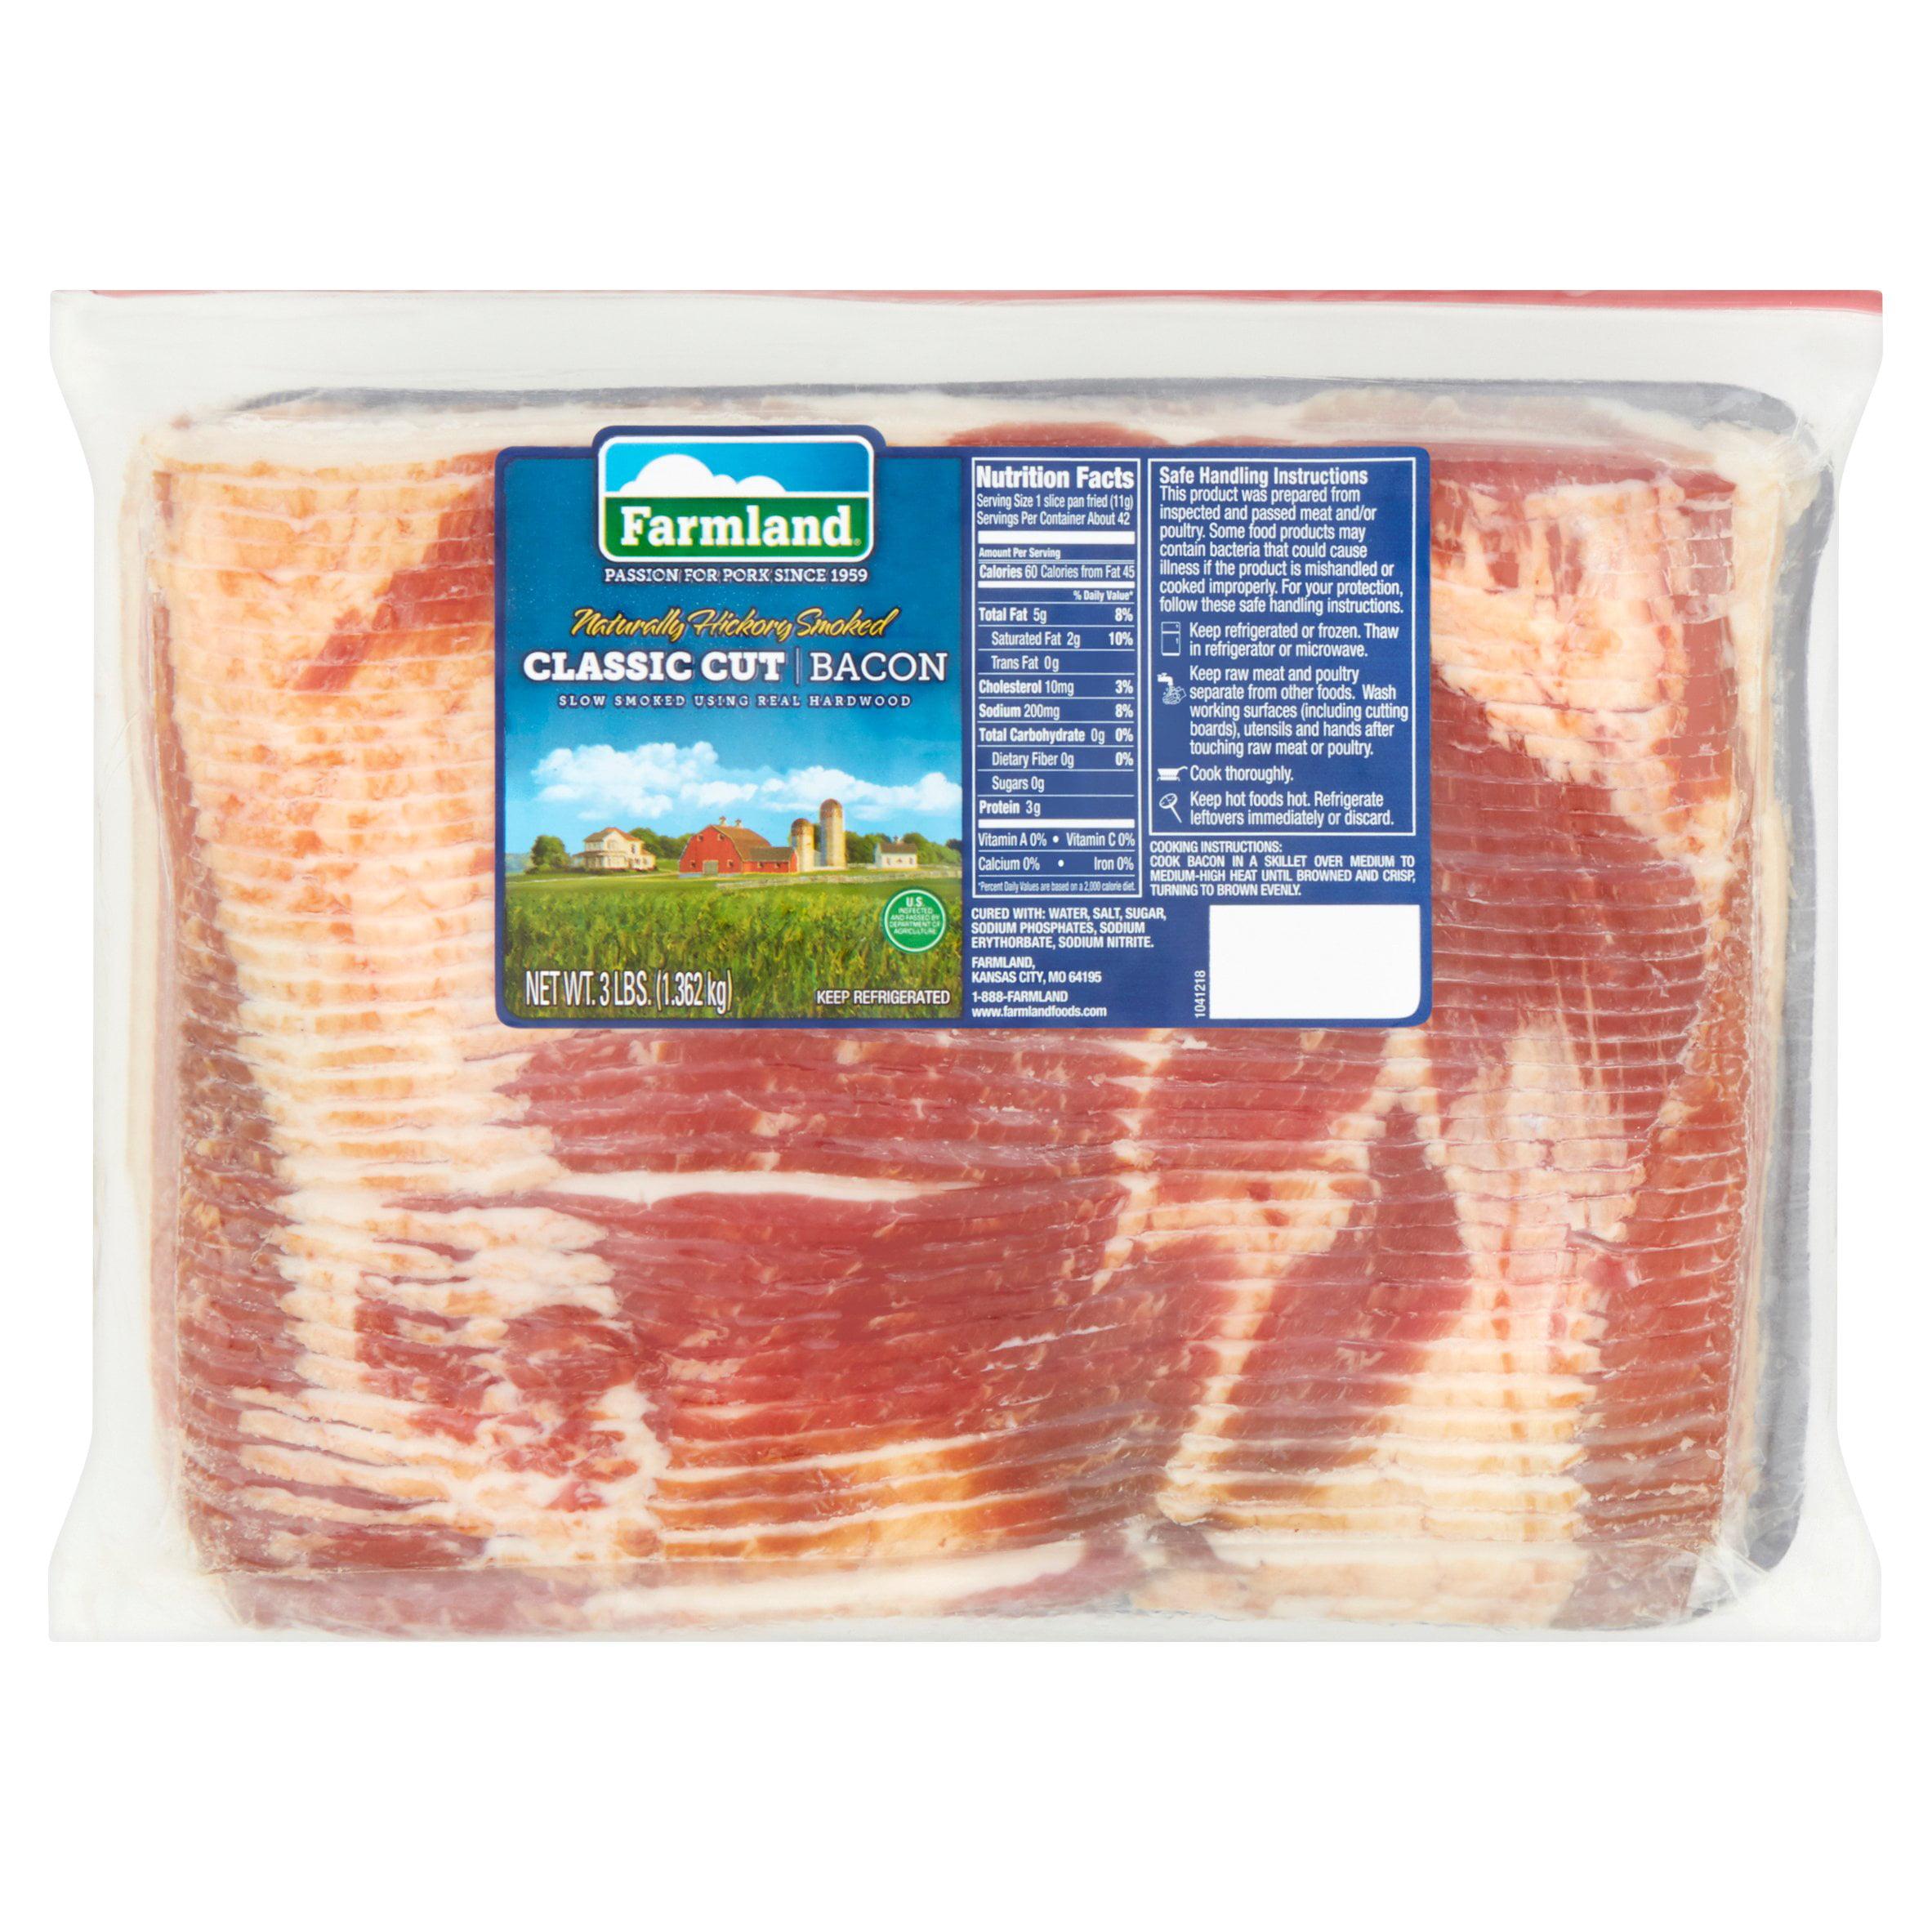 Farmland Naturally Hickory Smoked Classic Cut Bacon, 3 lbs